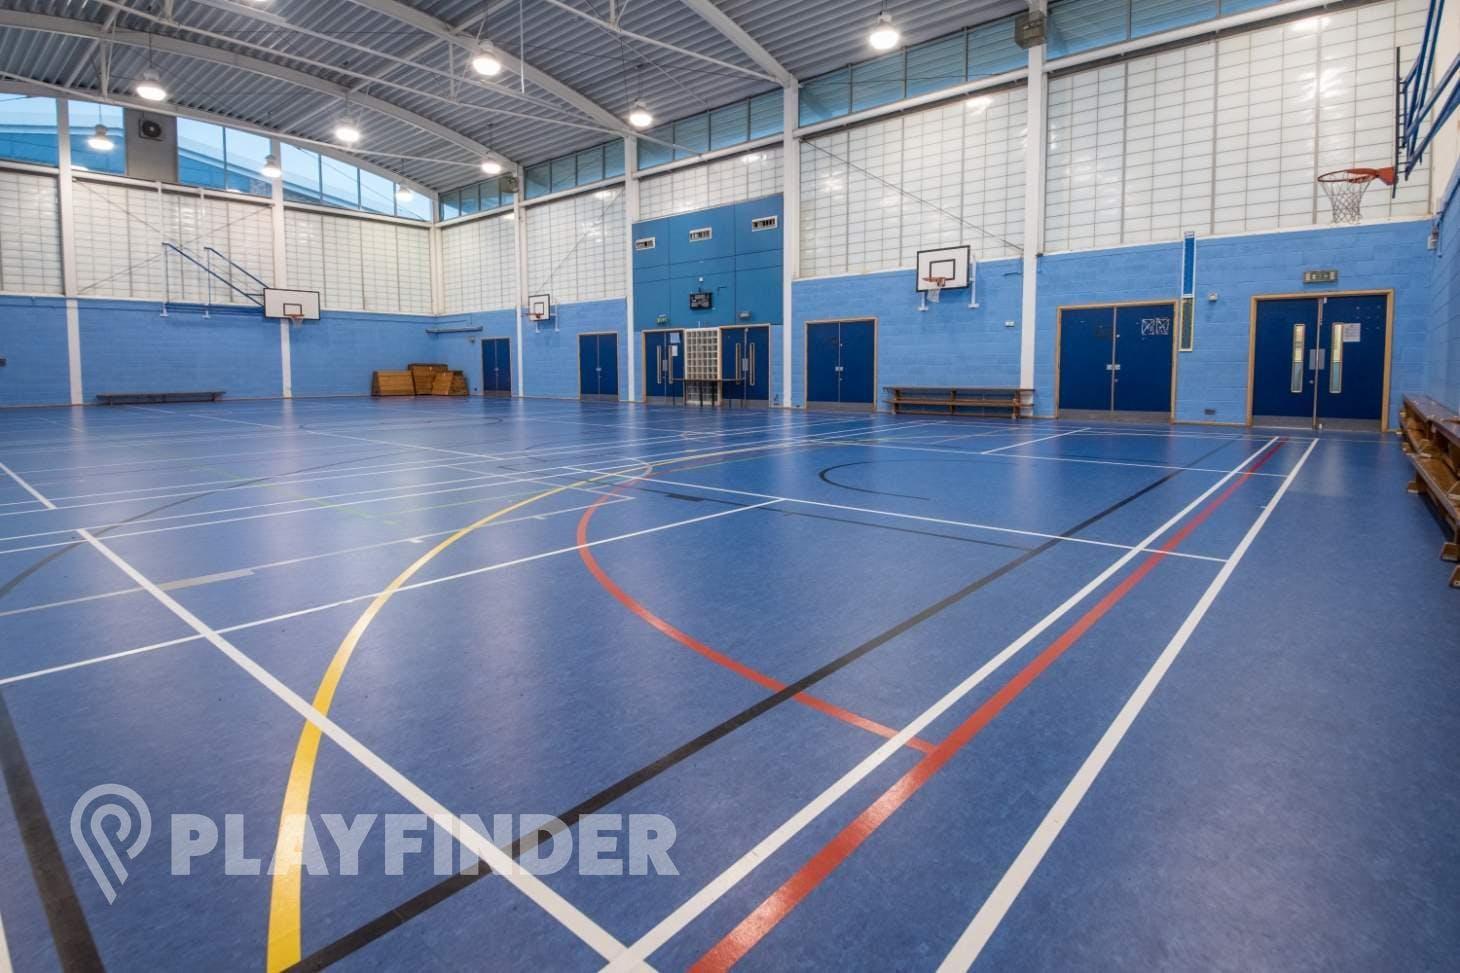 Ark Burlington Danes Academy Court | Sports hall basketball court